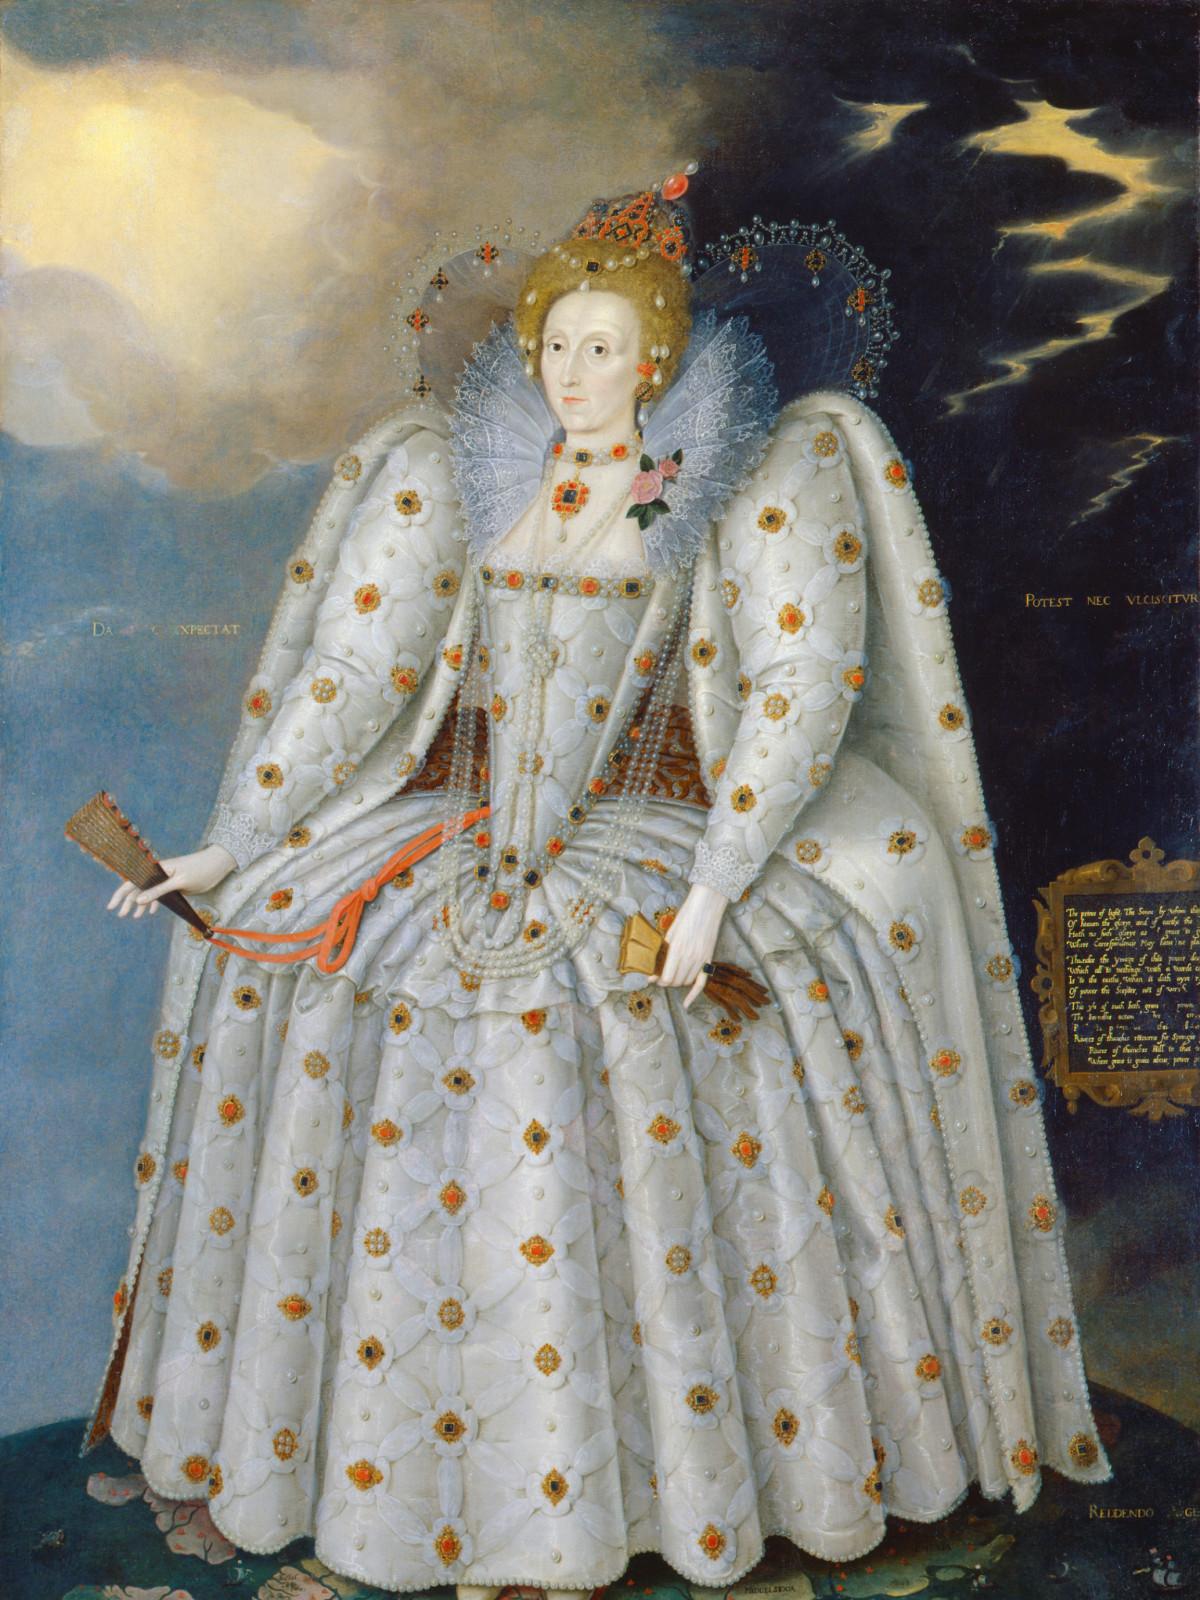 MFAH Tudors to Windsors, Marcus Gheeraerts the Younger, Queen Elizabeth I